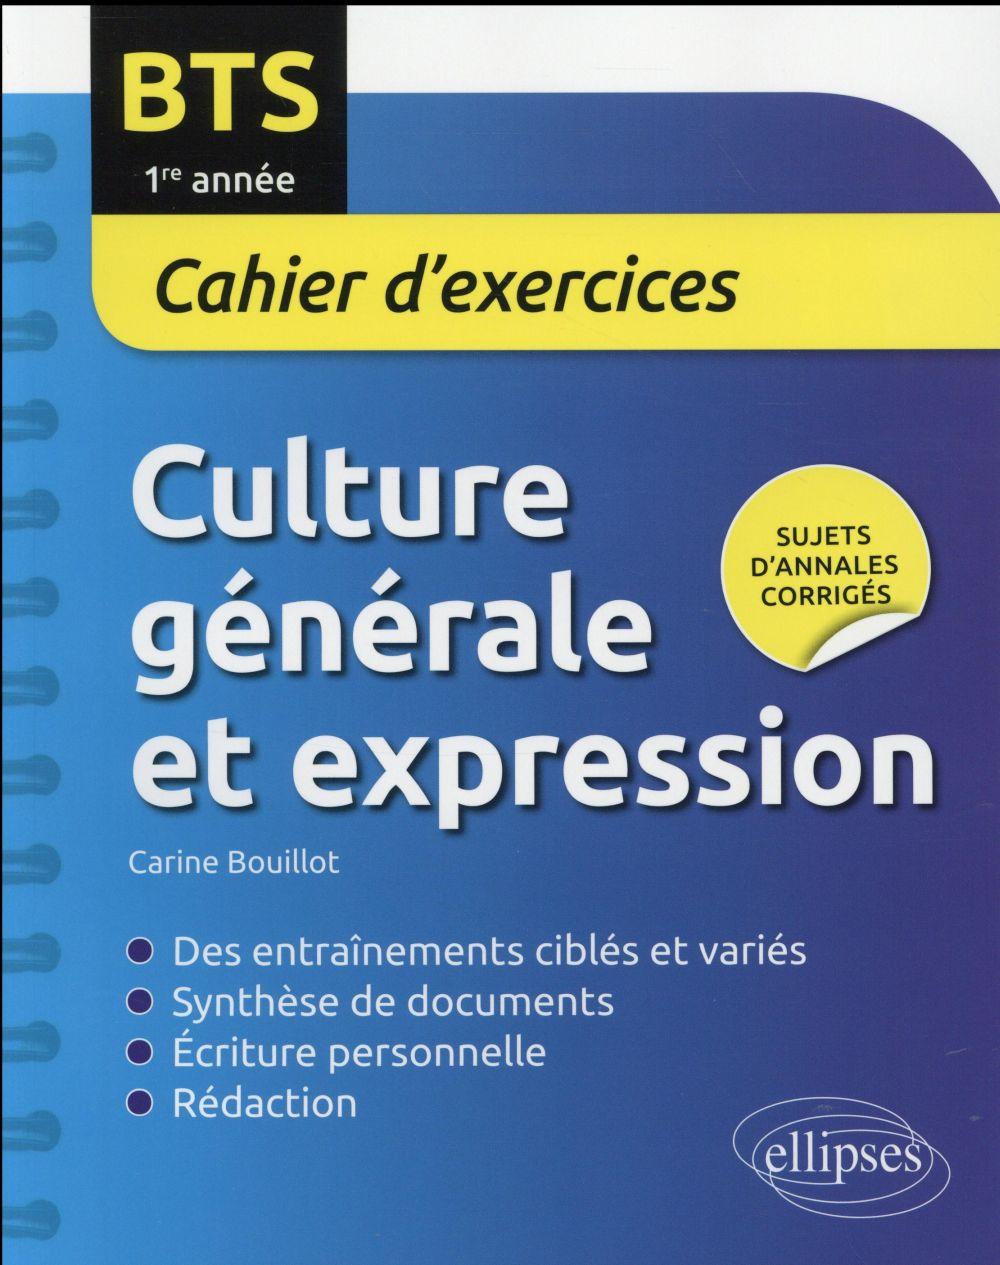 BTS. CULTURE GENERALE ET EXPRESSION CAHIER D EXERCICES. 1RE ANNEE Bouillot Carine